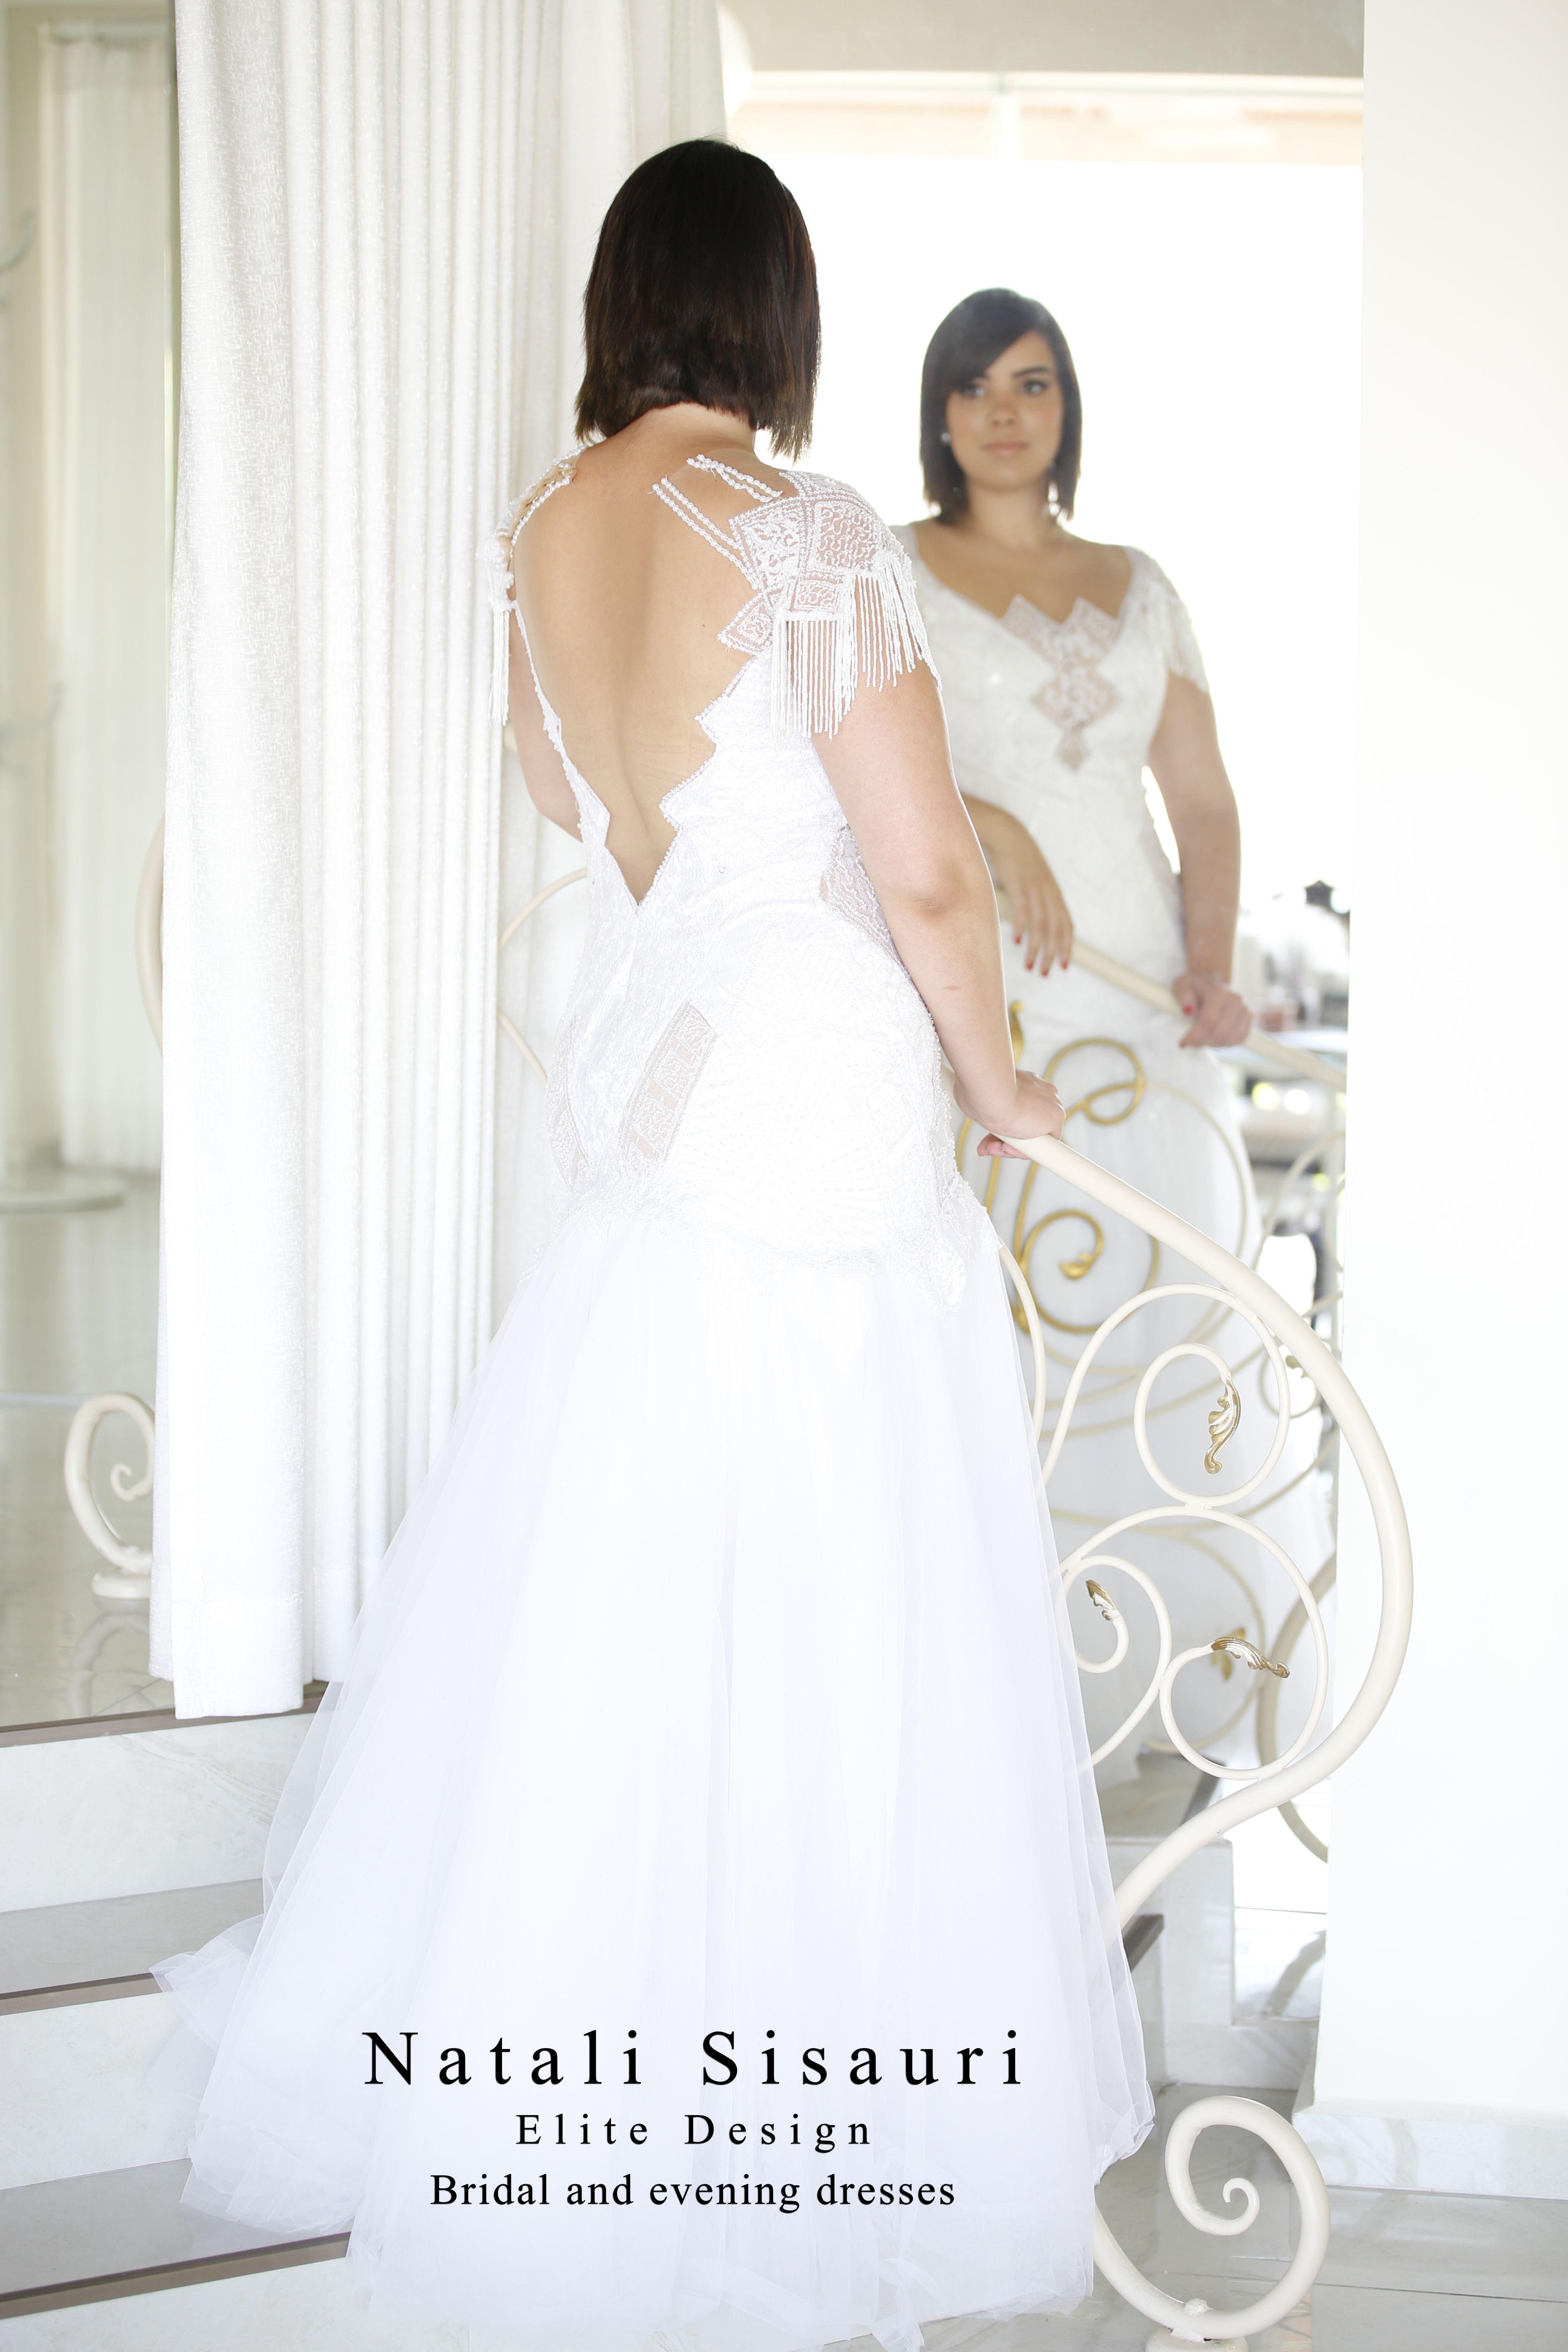 Elite wedding dresses  bride wedding dress whitedress weddinggown beautiful